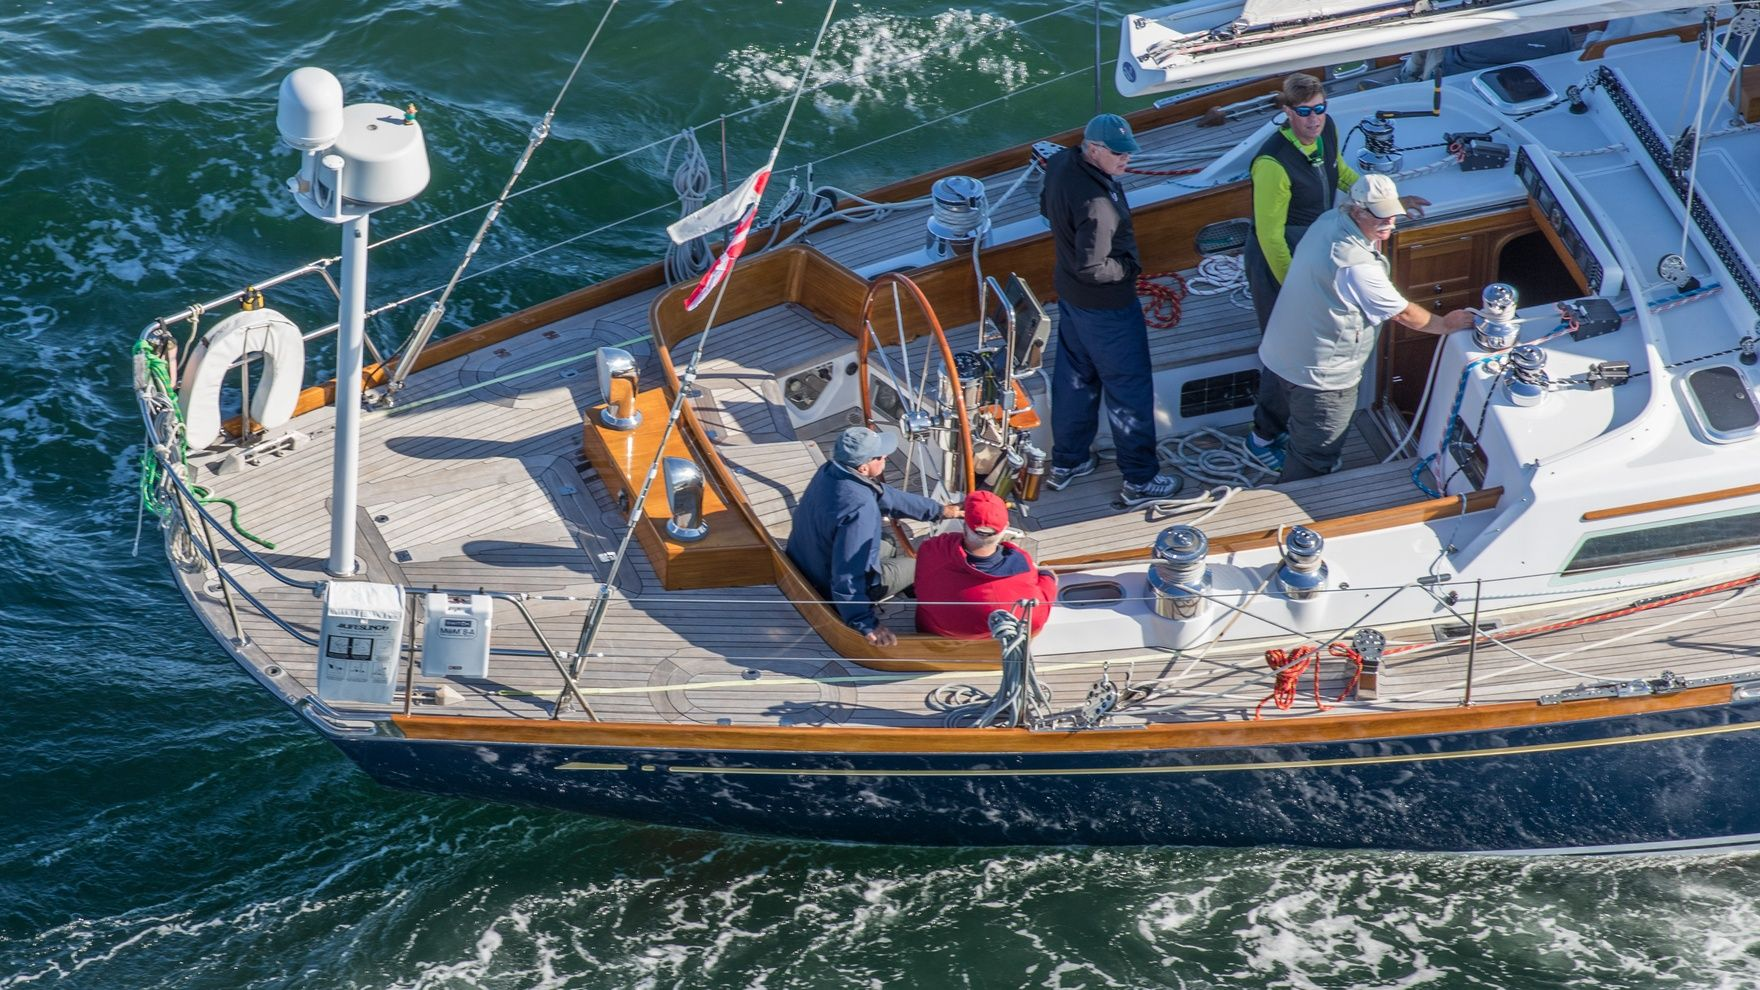 Newport Bermuda Race 2020